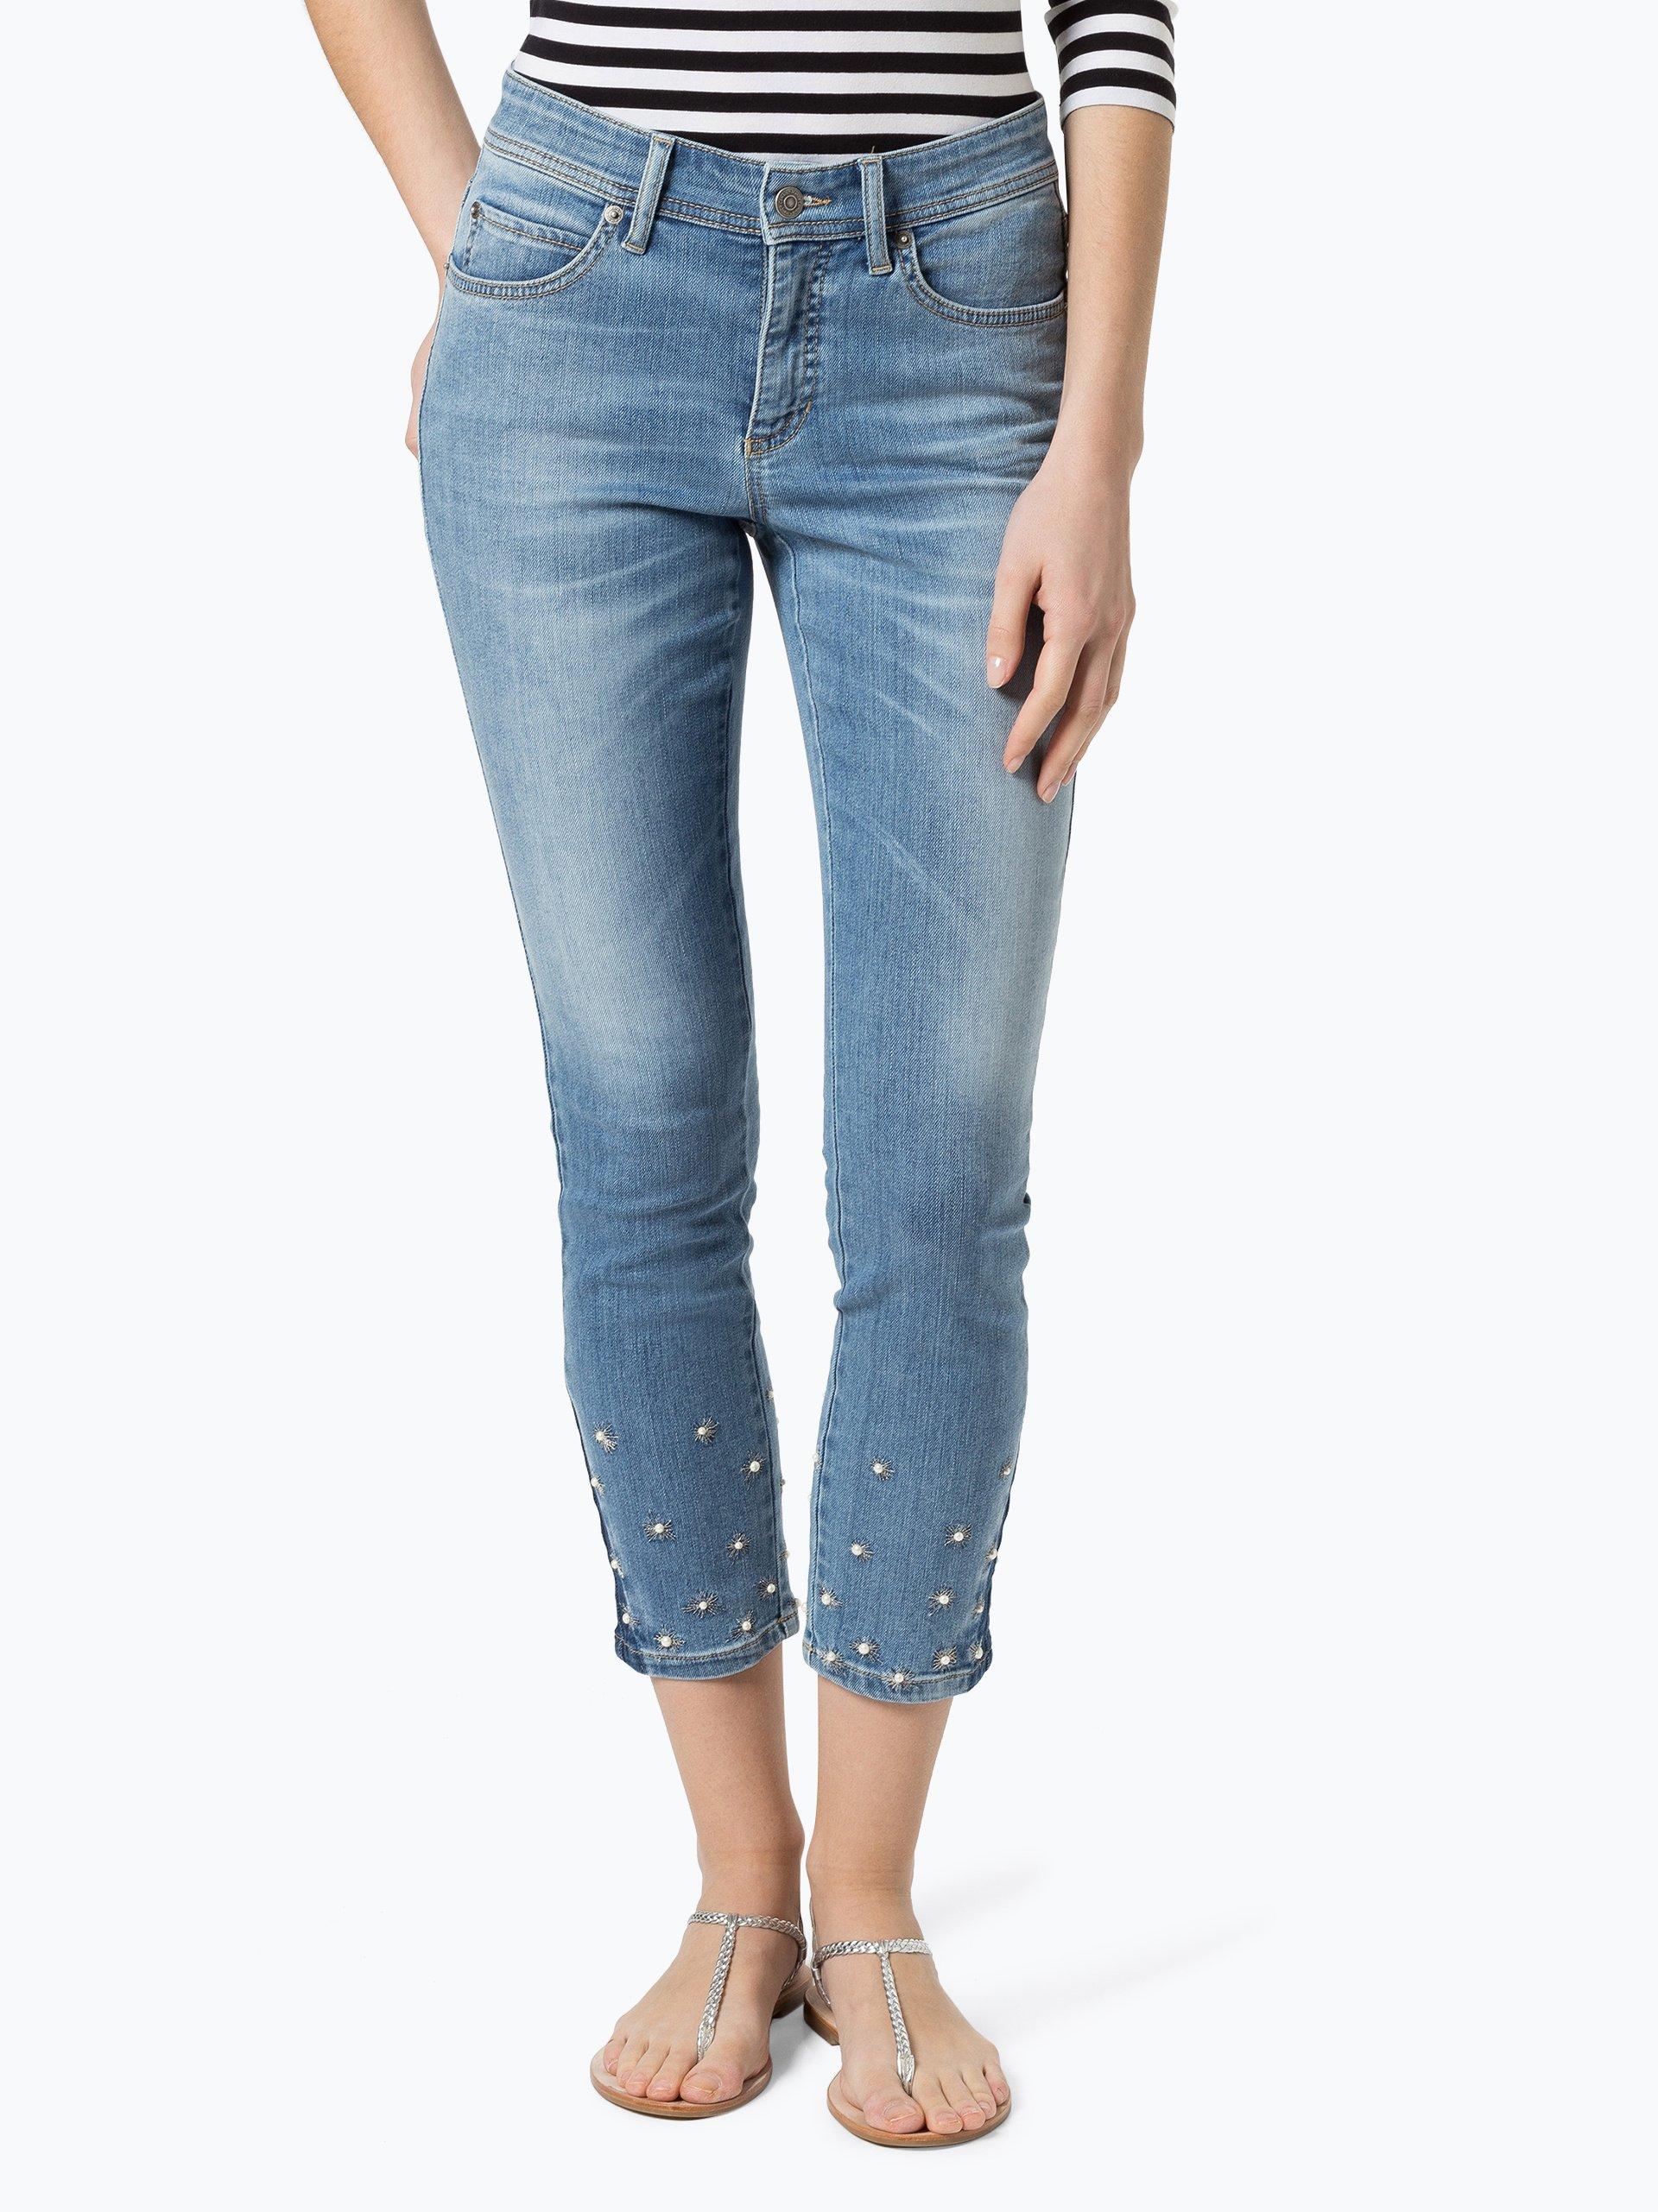 cambio damen jeans parla light stone gemustert online kaufen vangraaf com. Black Bedroom Furniture Sets. Home Design Ideas